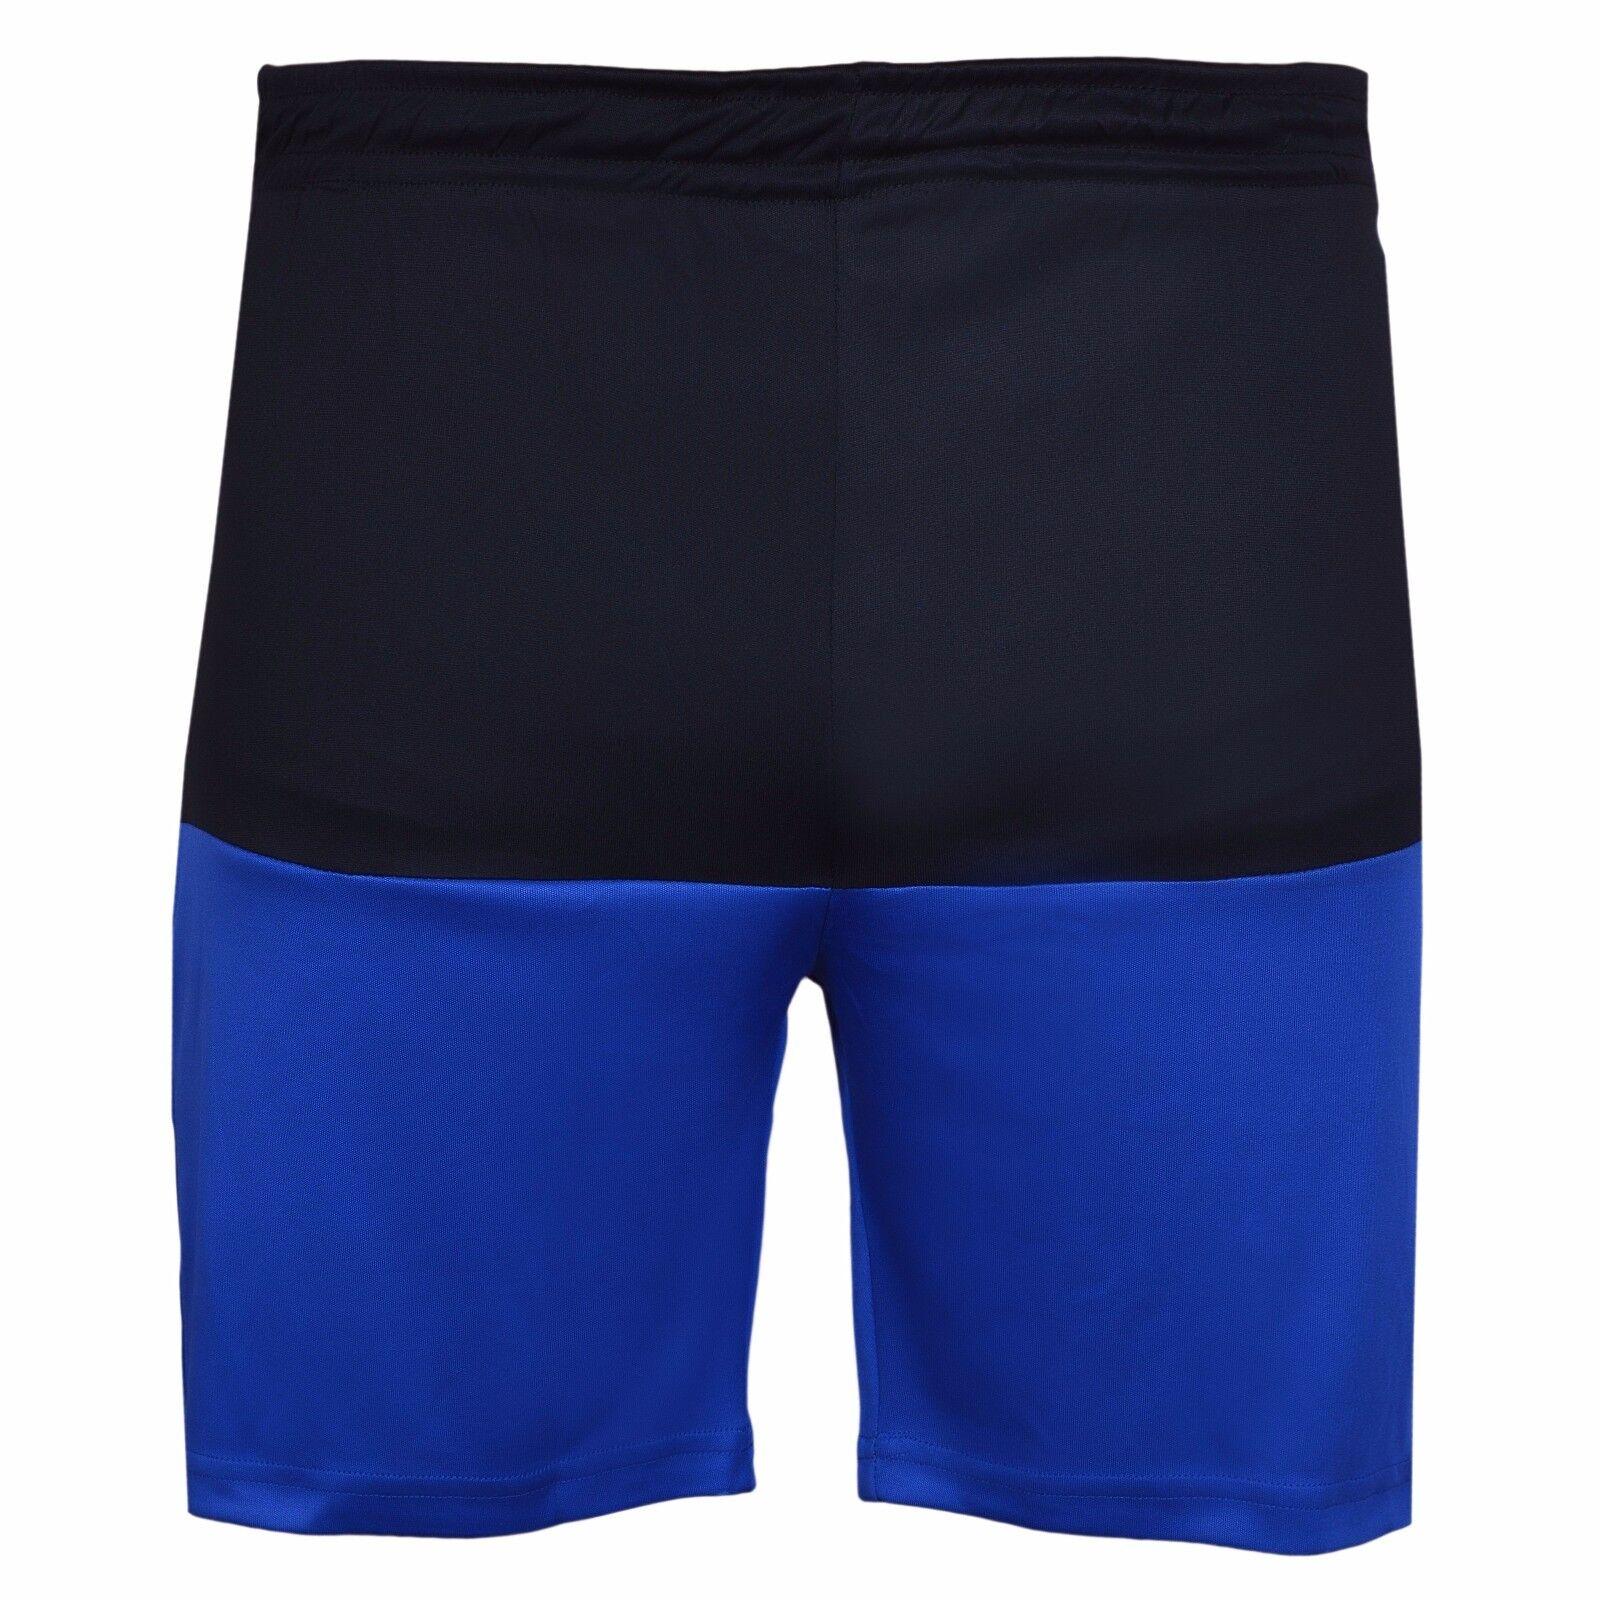 BLACK/BLUE-H